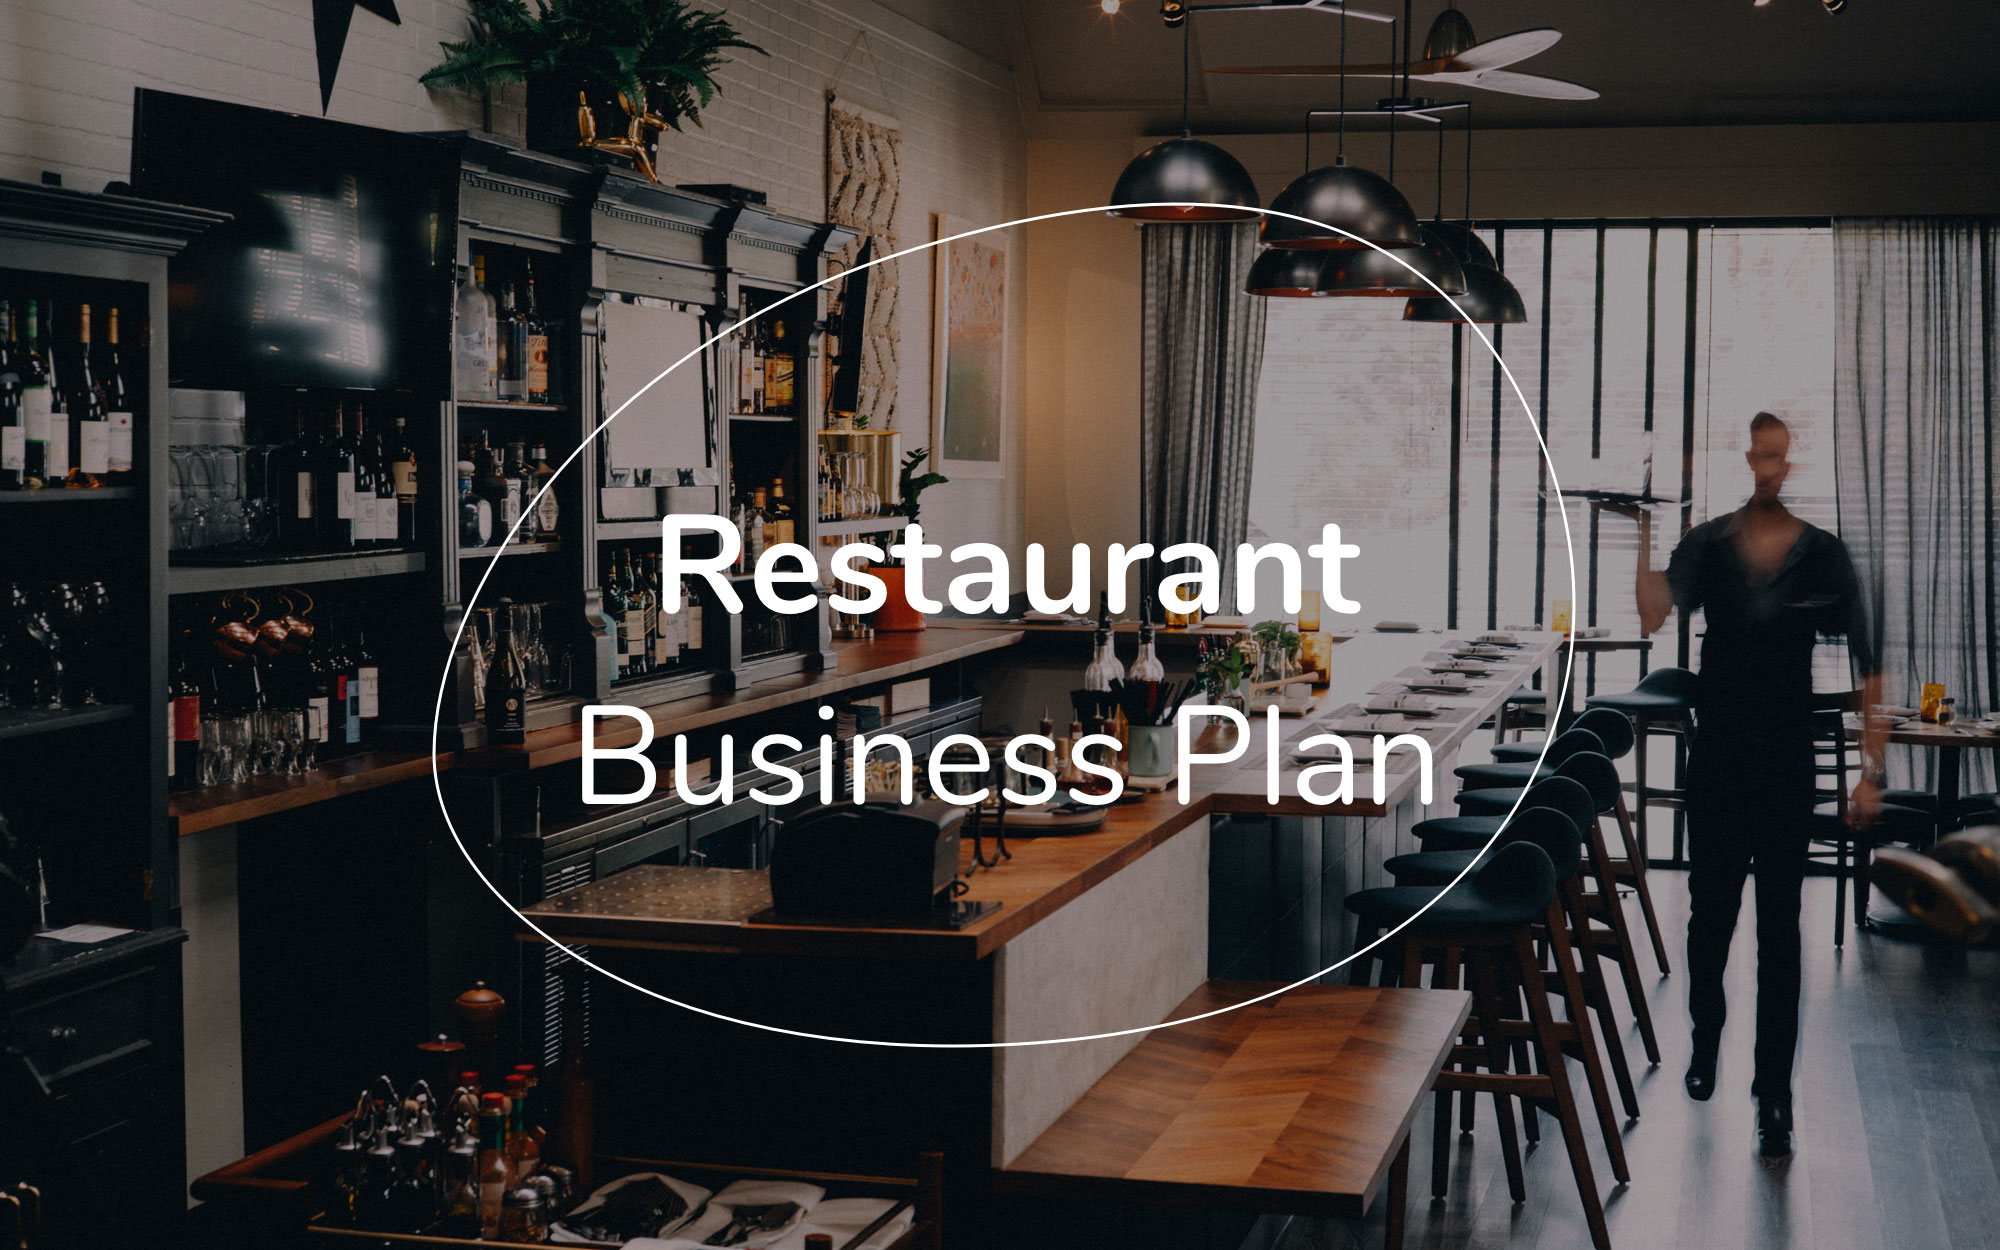 Restaurant business plan template free pdf ppt download slidebean restaurant business plan template free pdf ppt download wajeb Gallery